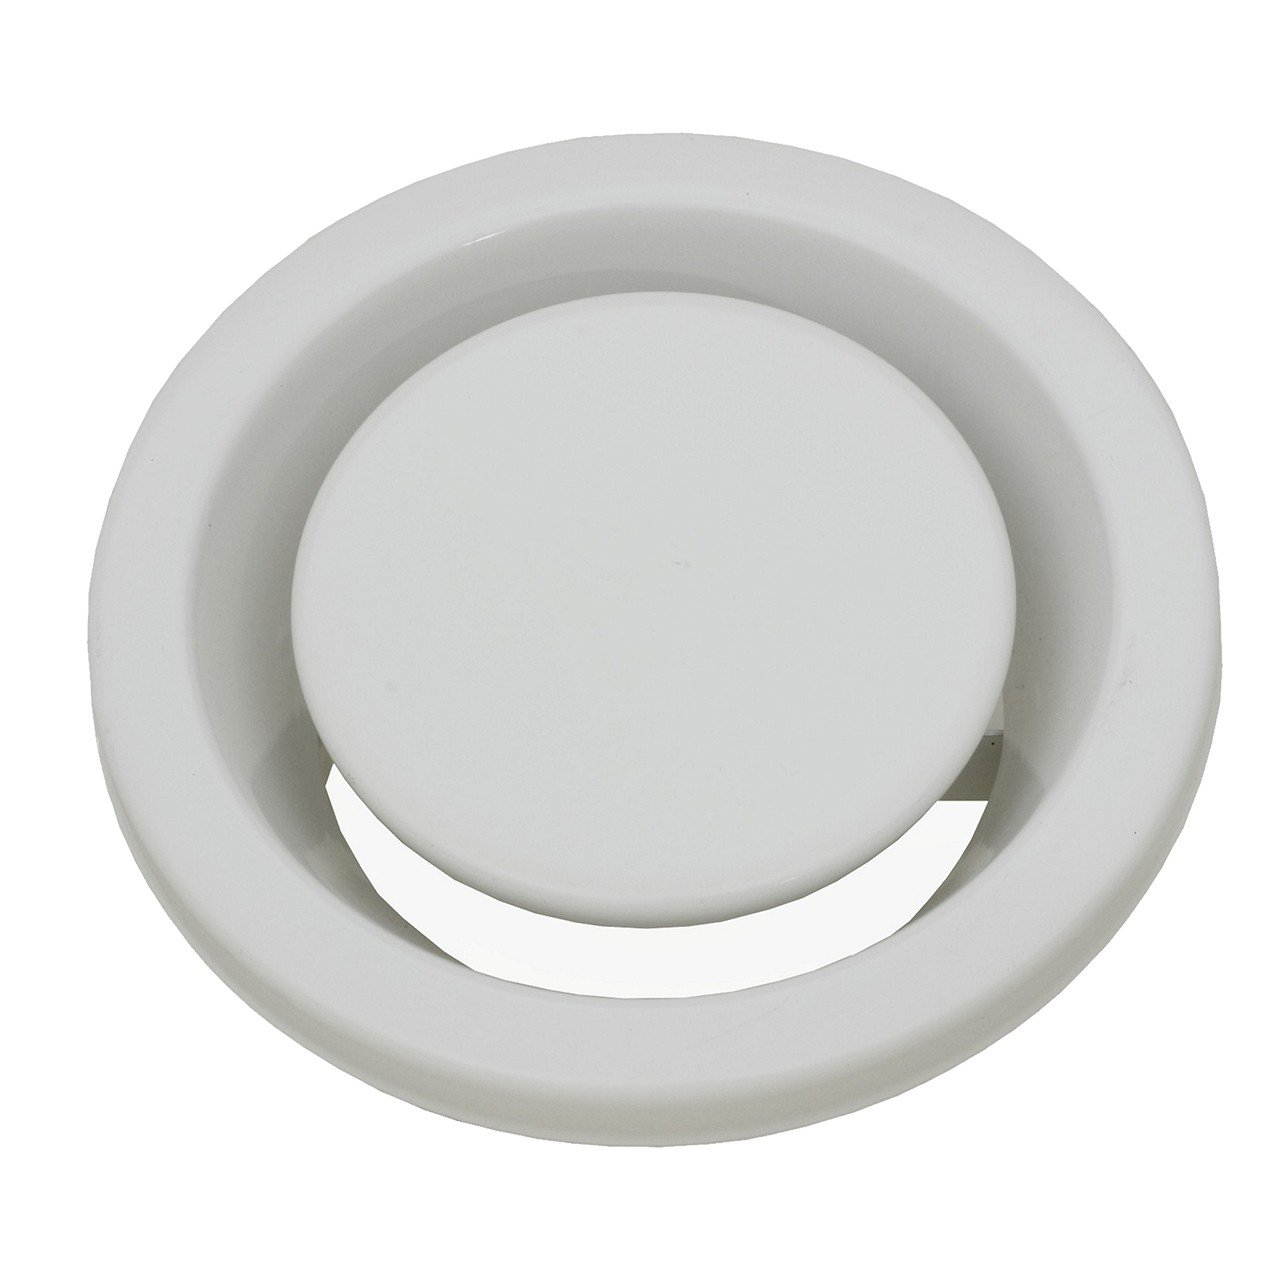 Lüftung Abluftventil/Tellerventil DN/Durchmesser Ø 125 mm Selfio